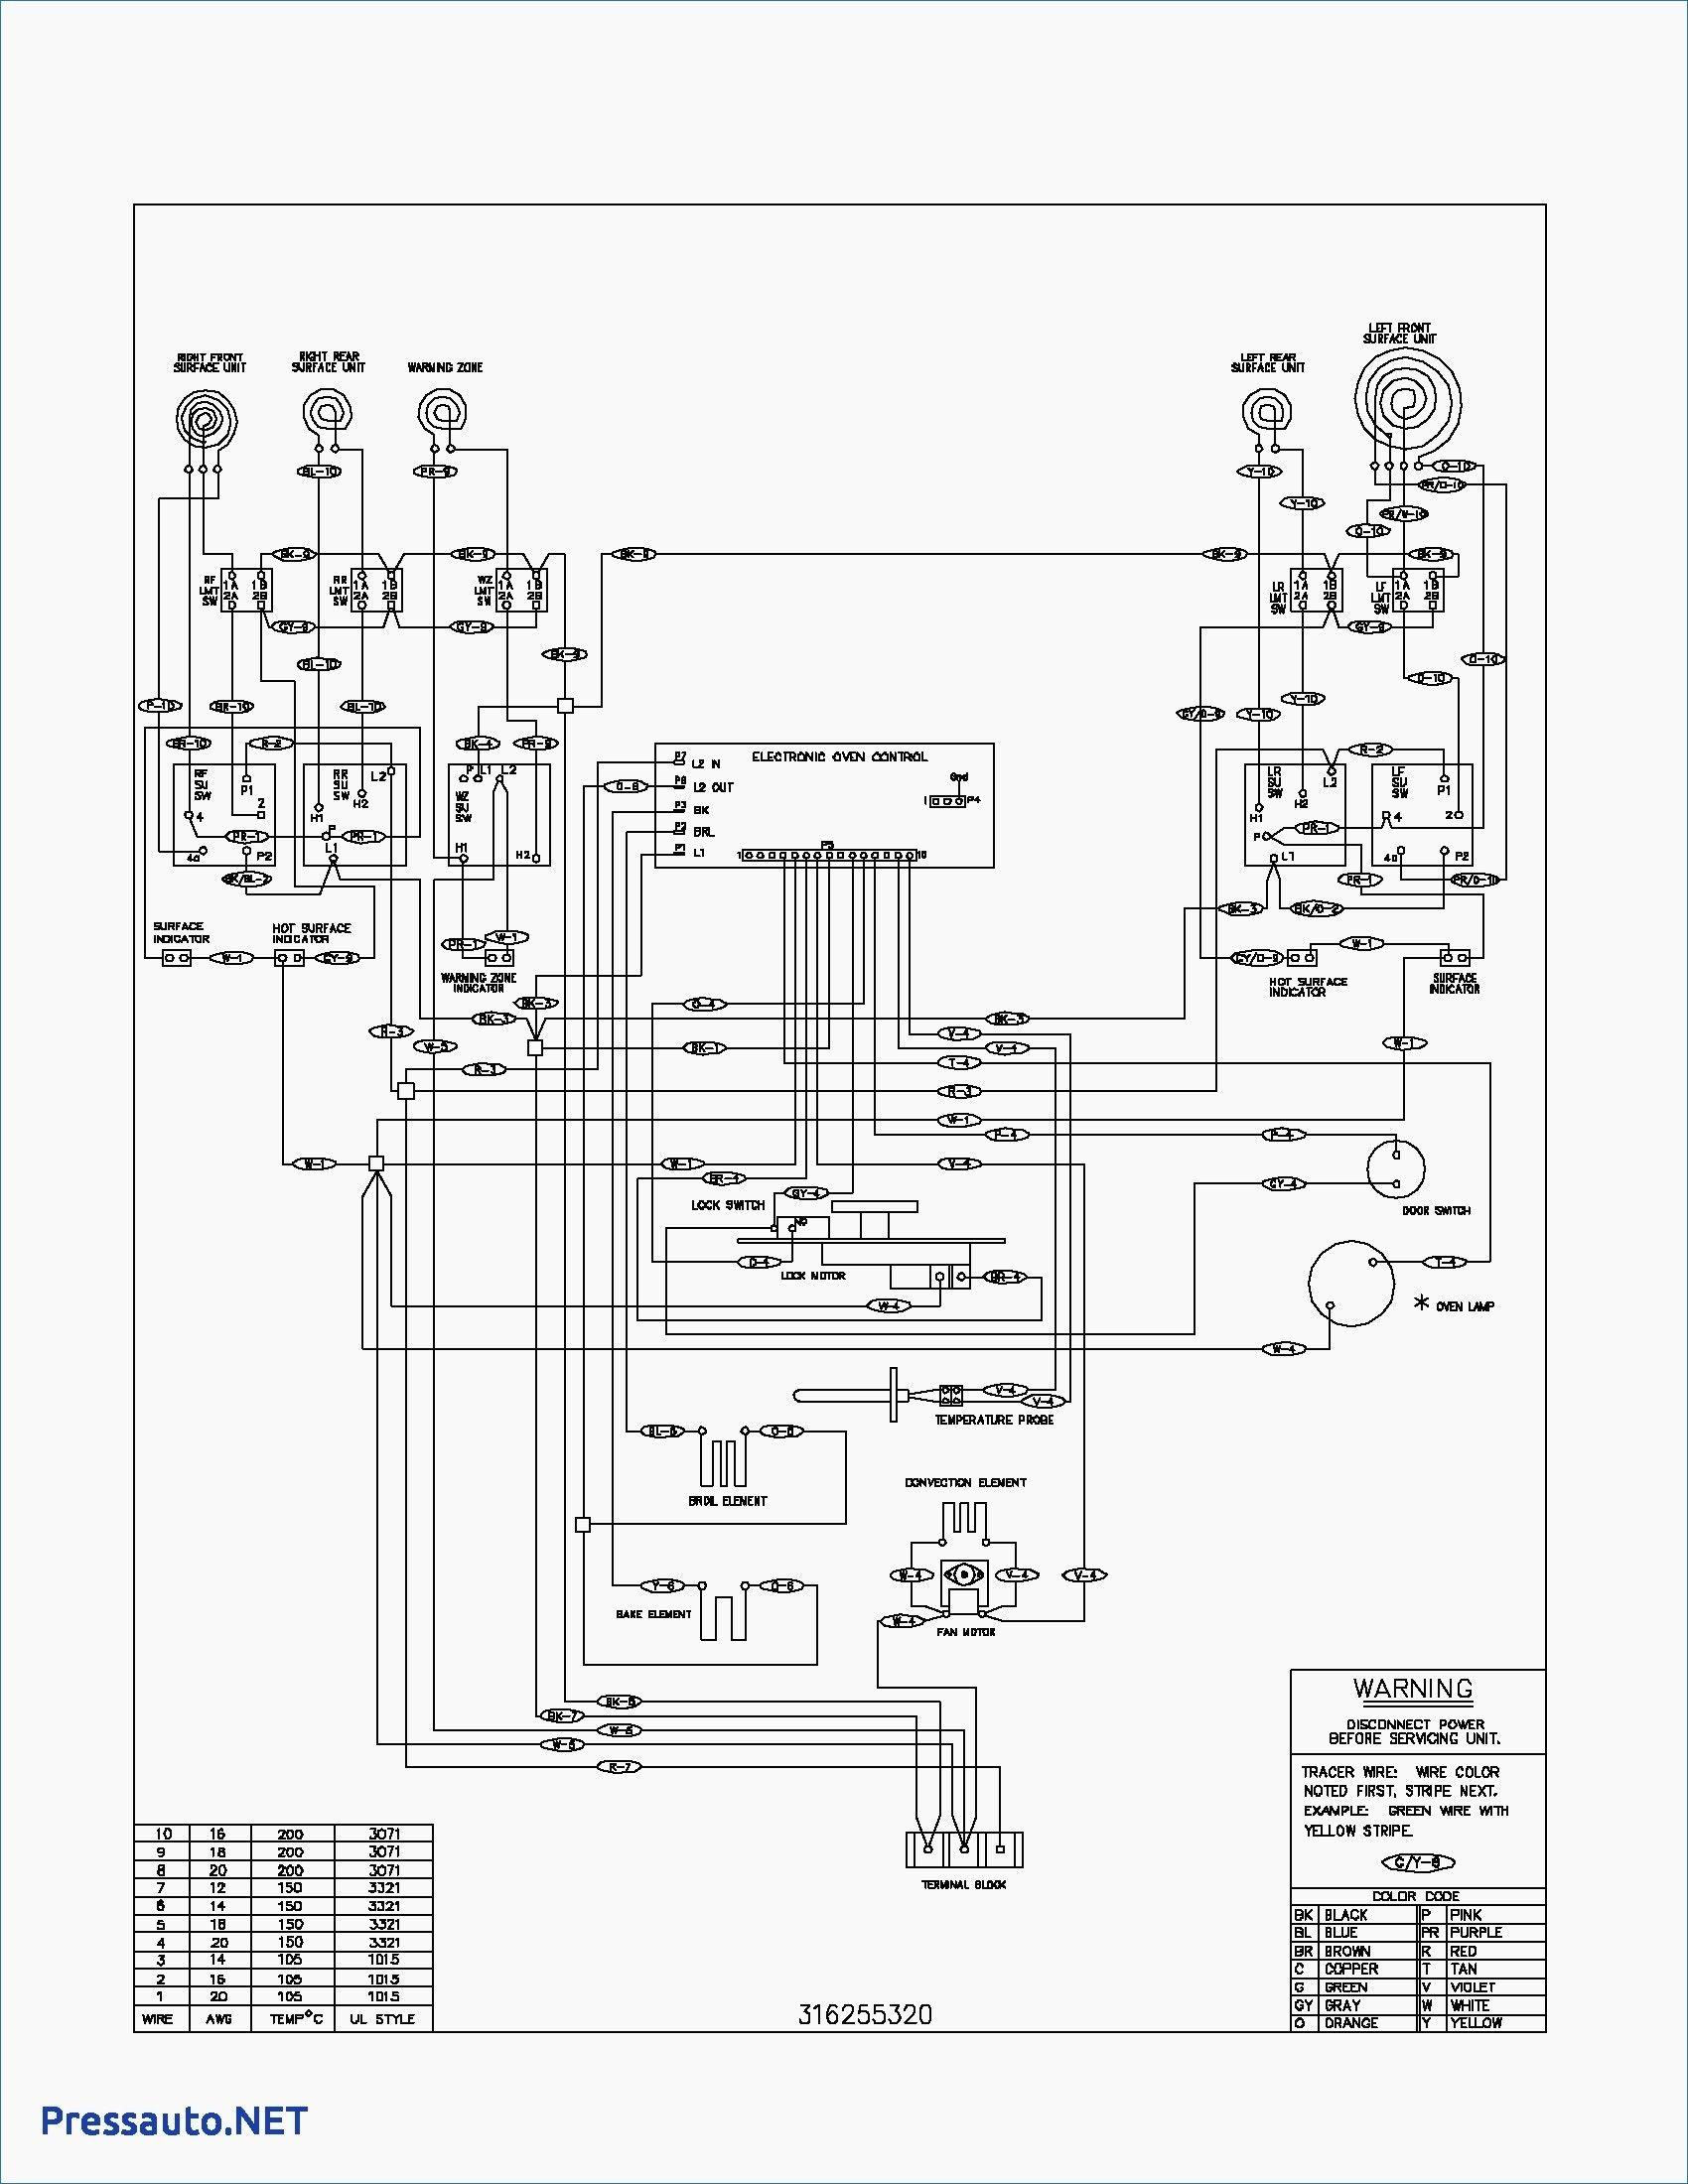 Bosch Refrigerator Wiring Diagram - Clarion Car Radio Wiring Diagram -  hyundaiii.tukune.jeanjaures37.frWiring Diagram Resource